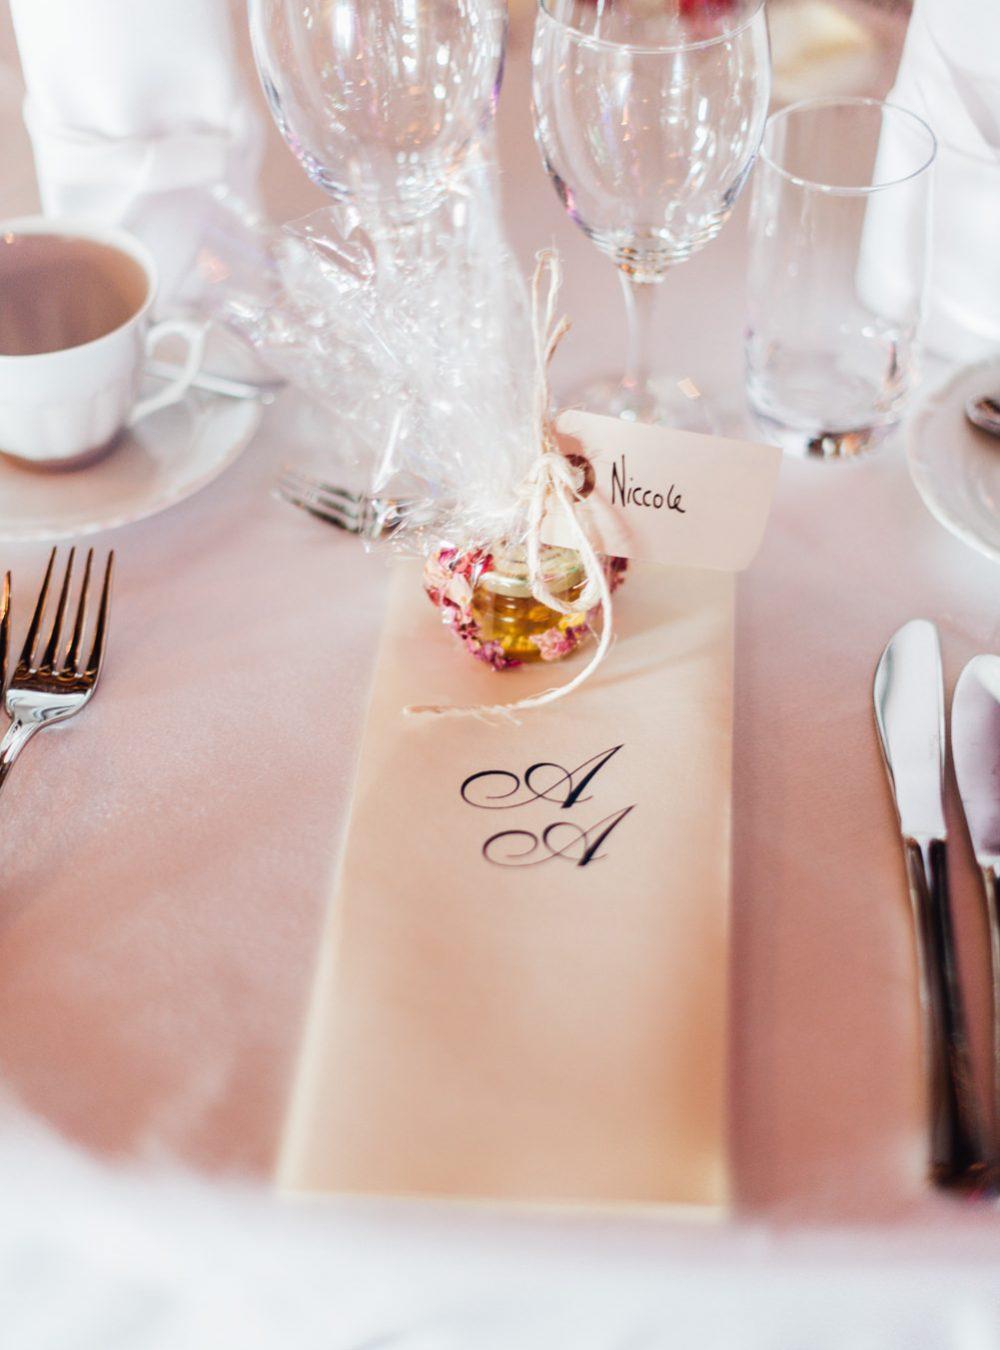 Ali-Shokofan-Asal-Fard-Wedding-Brollop-Telegrafberget-Persian-Nacka-Stockholm-Fotograf-Martina-Lundborg-54